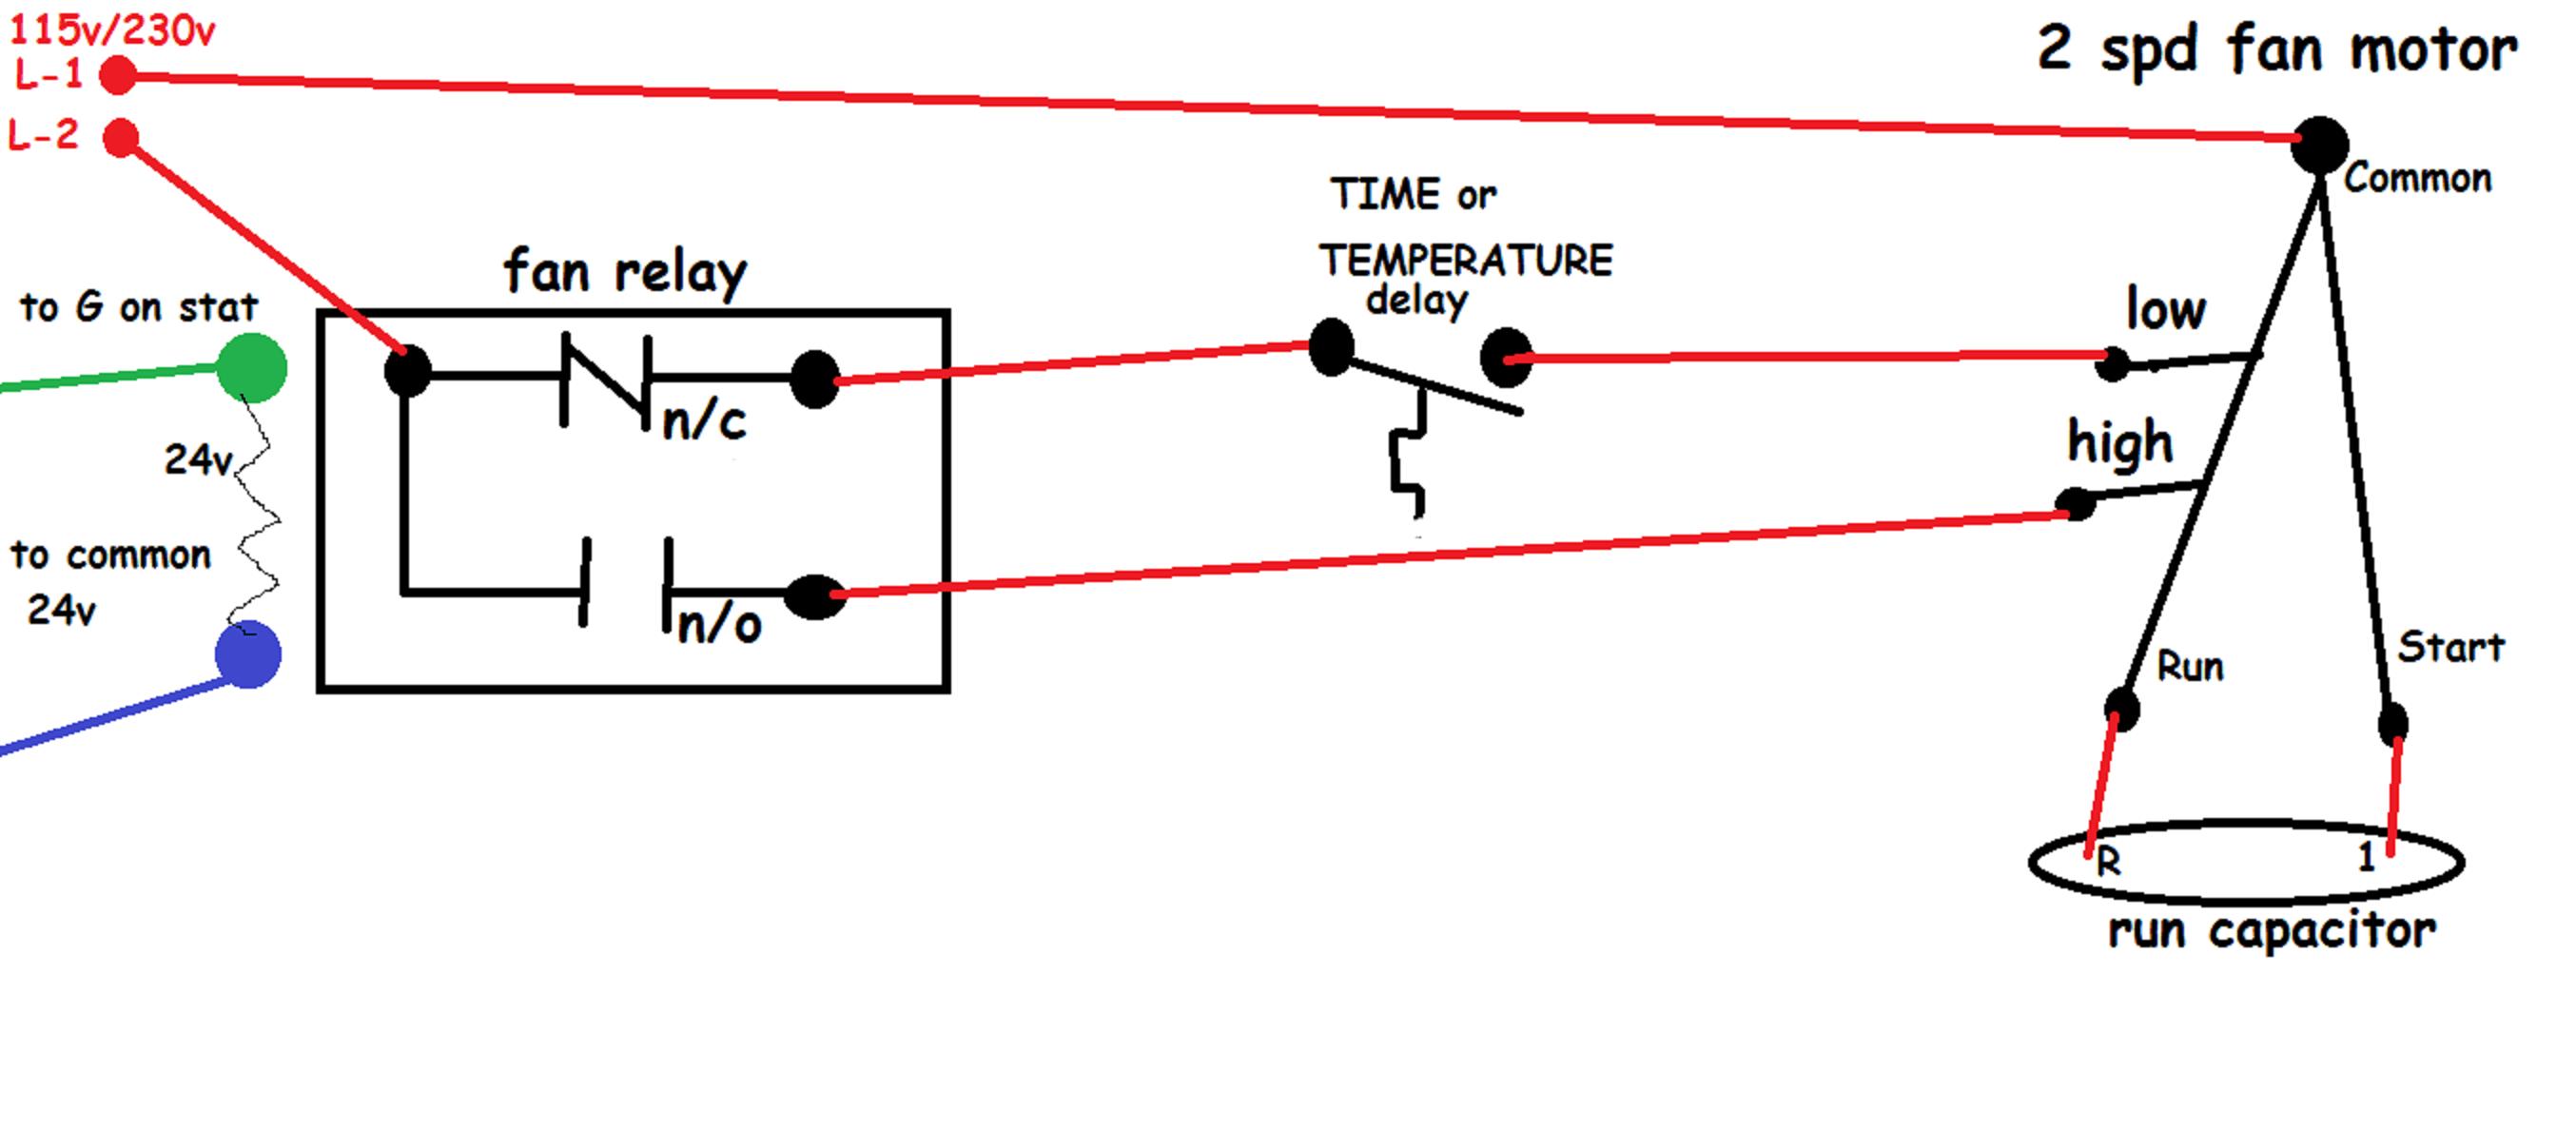 5qo8m?resize=665%2C292&ssl=1 westlock limit switch wiring diagram wiring diagram westlock limit switch wiring diagram at mifinder.co